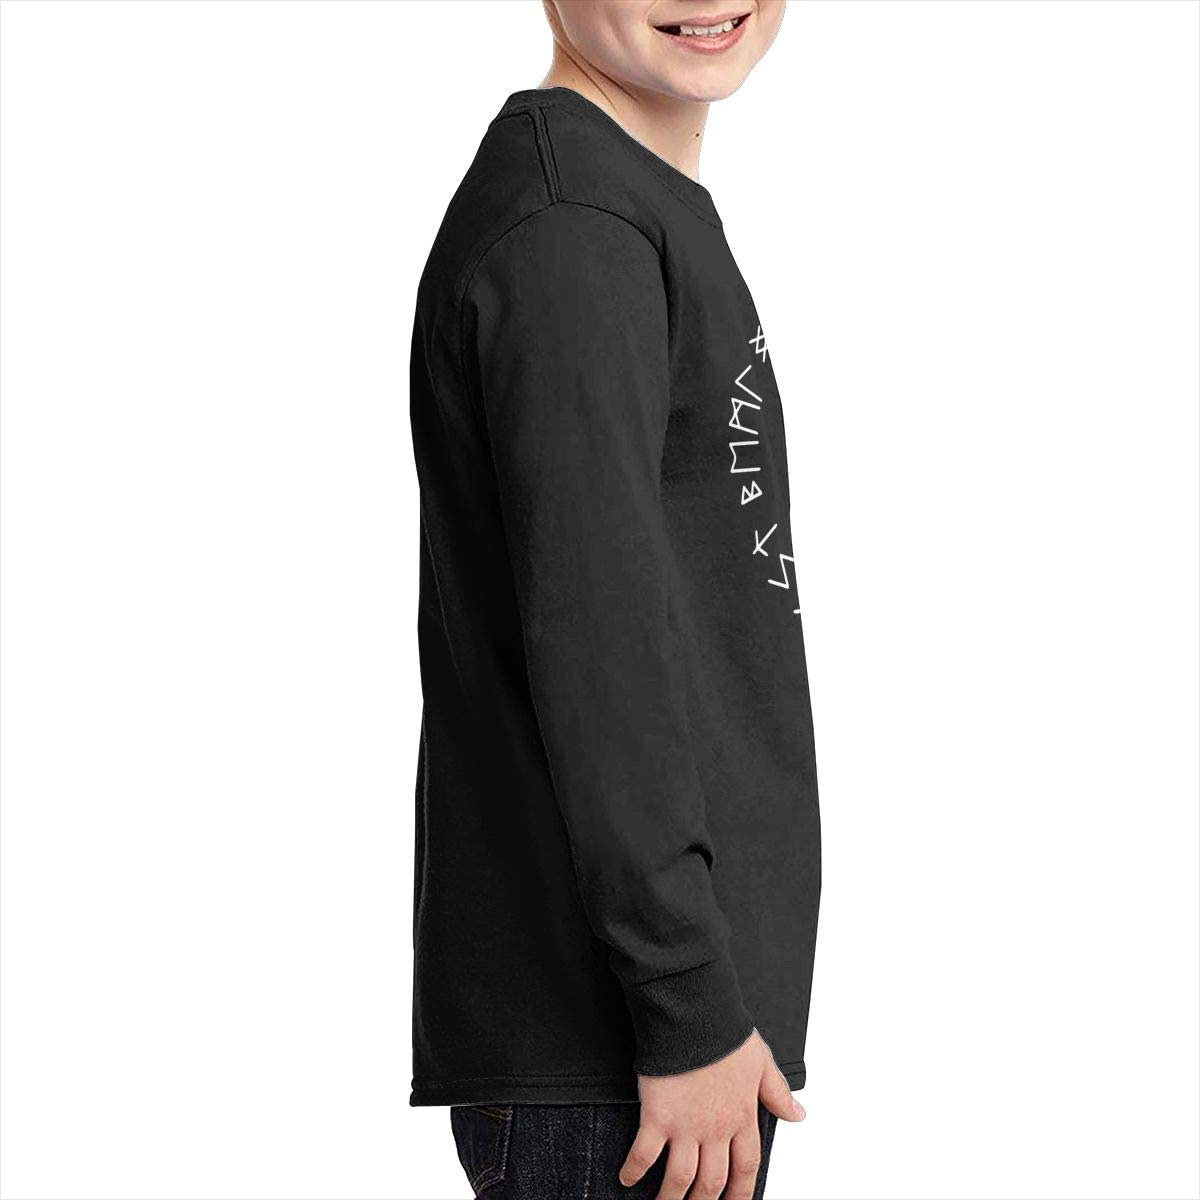 Vikings Mjolnir and Rune Wheel Norse Mythology Symbol Youth Boy Girl Sport Pullover Sweatshirt Unisex Shirt